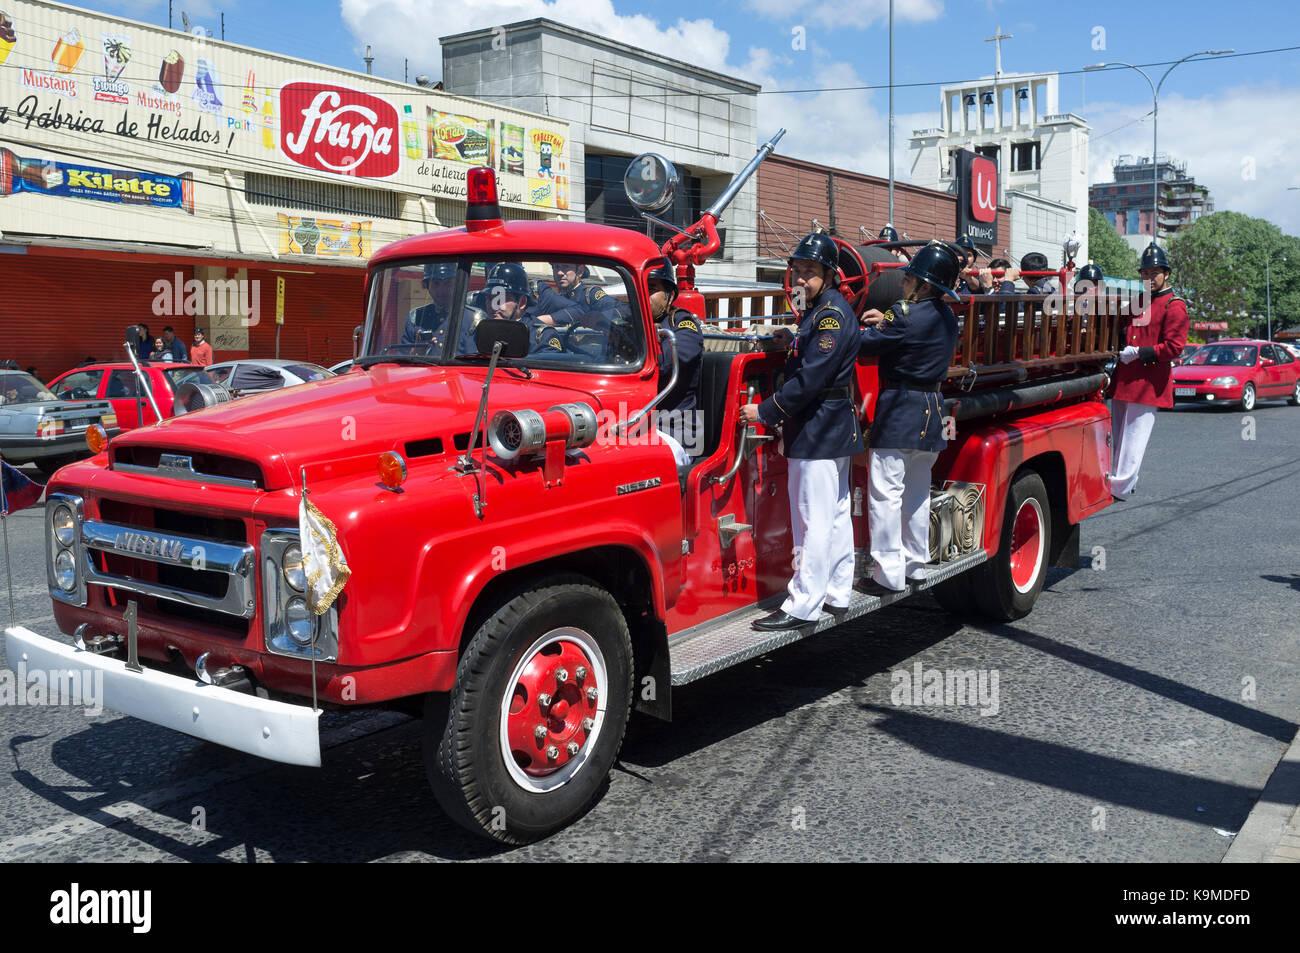 Restored Fire Truck Stock Photos & Restored Fire Truck Stock Images ...